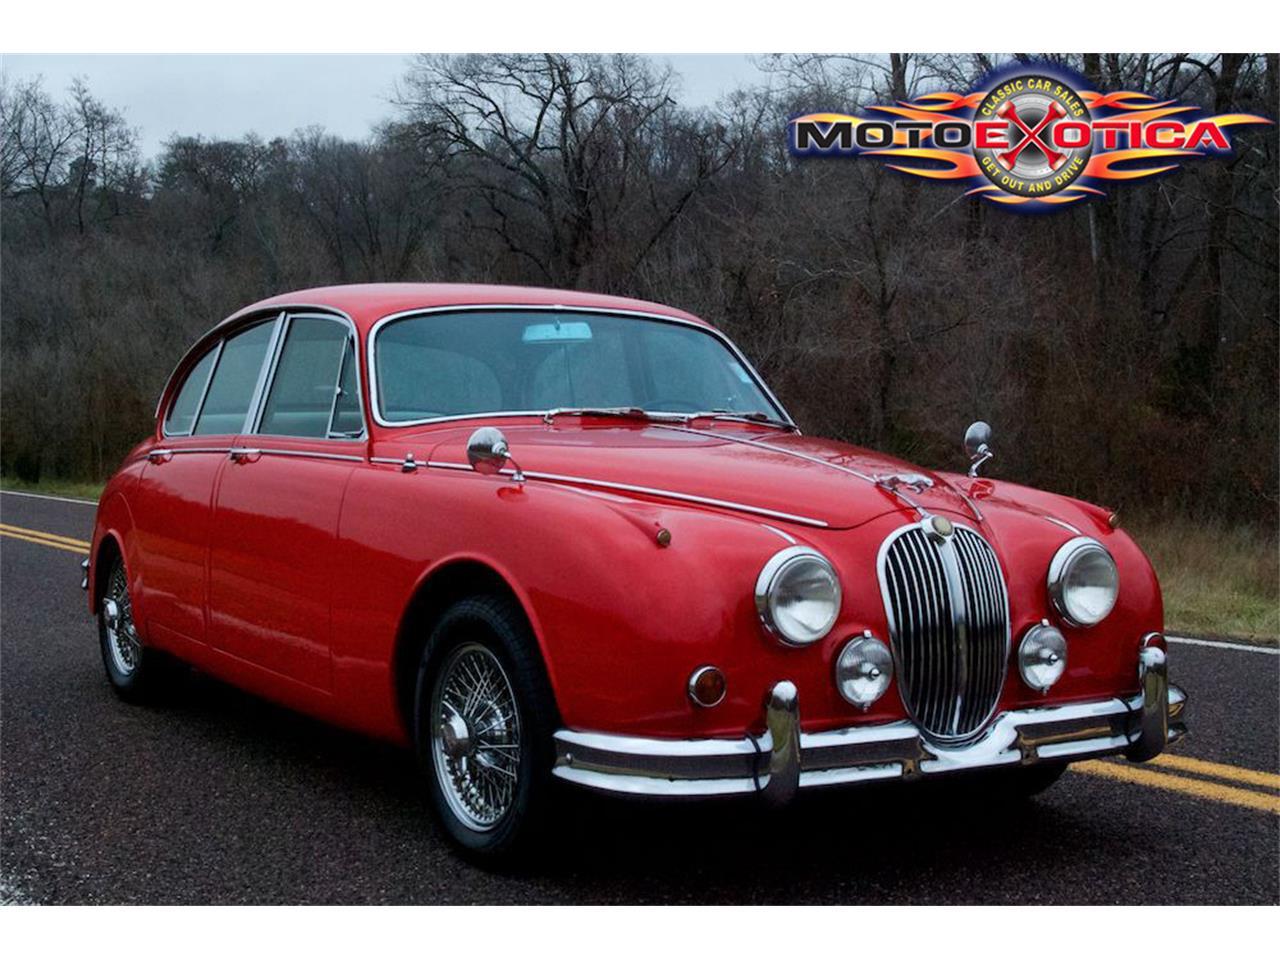 1963 Jaguar Mark II for Sale   ClassicCars.com   CC-614416